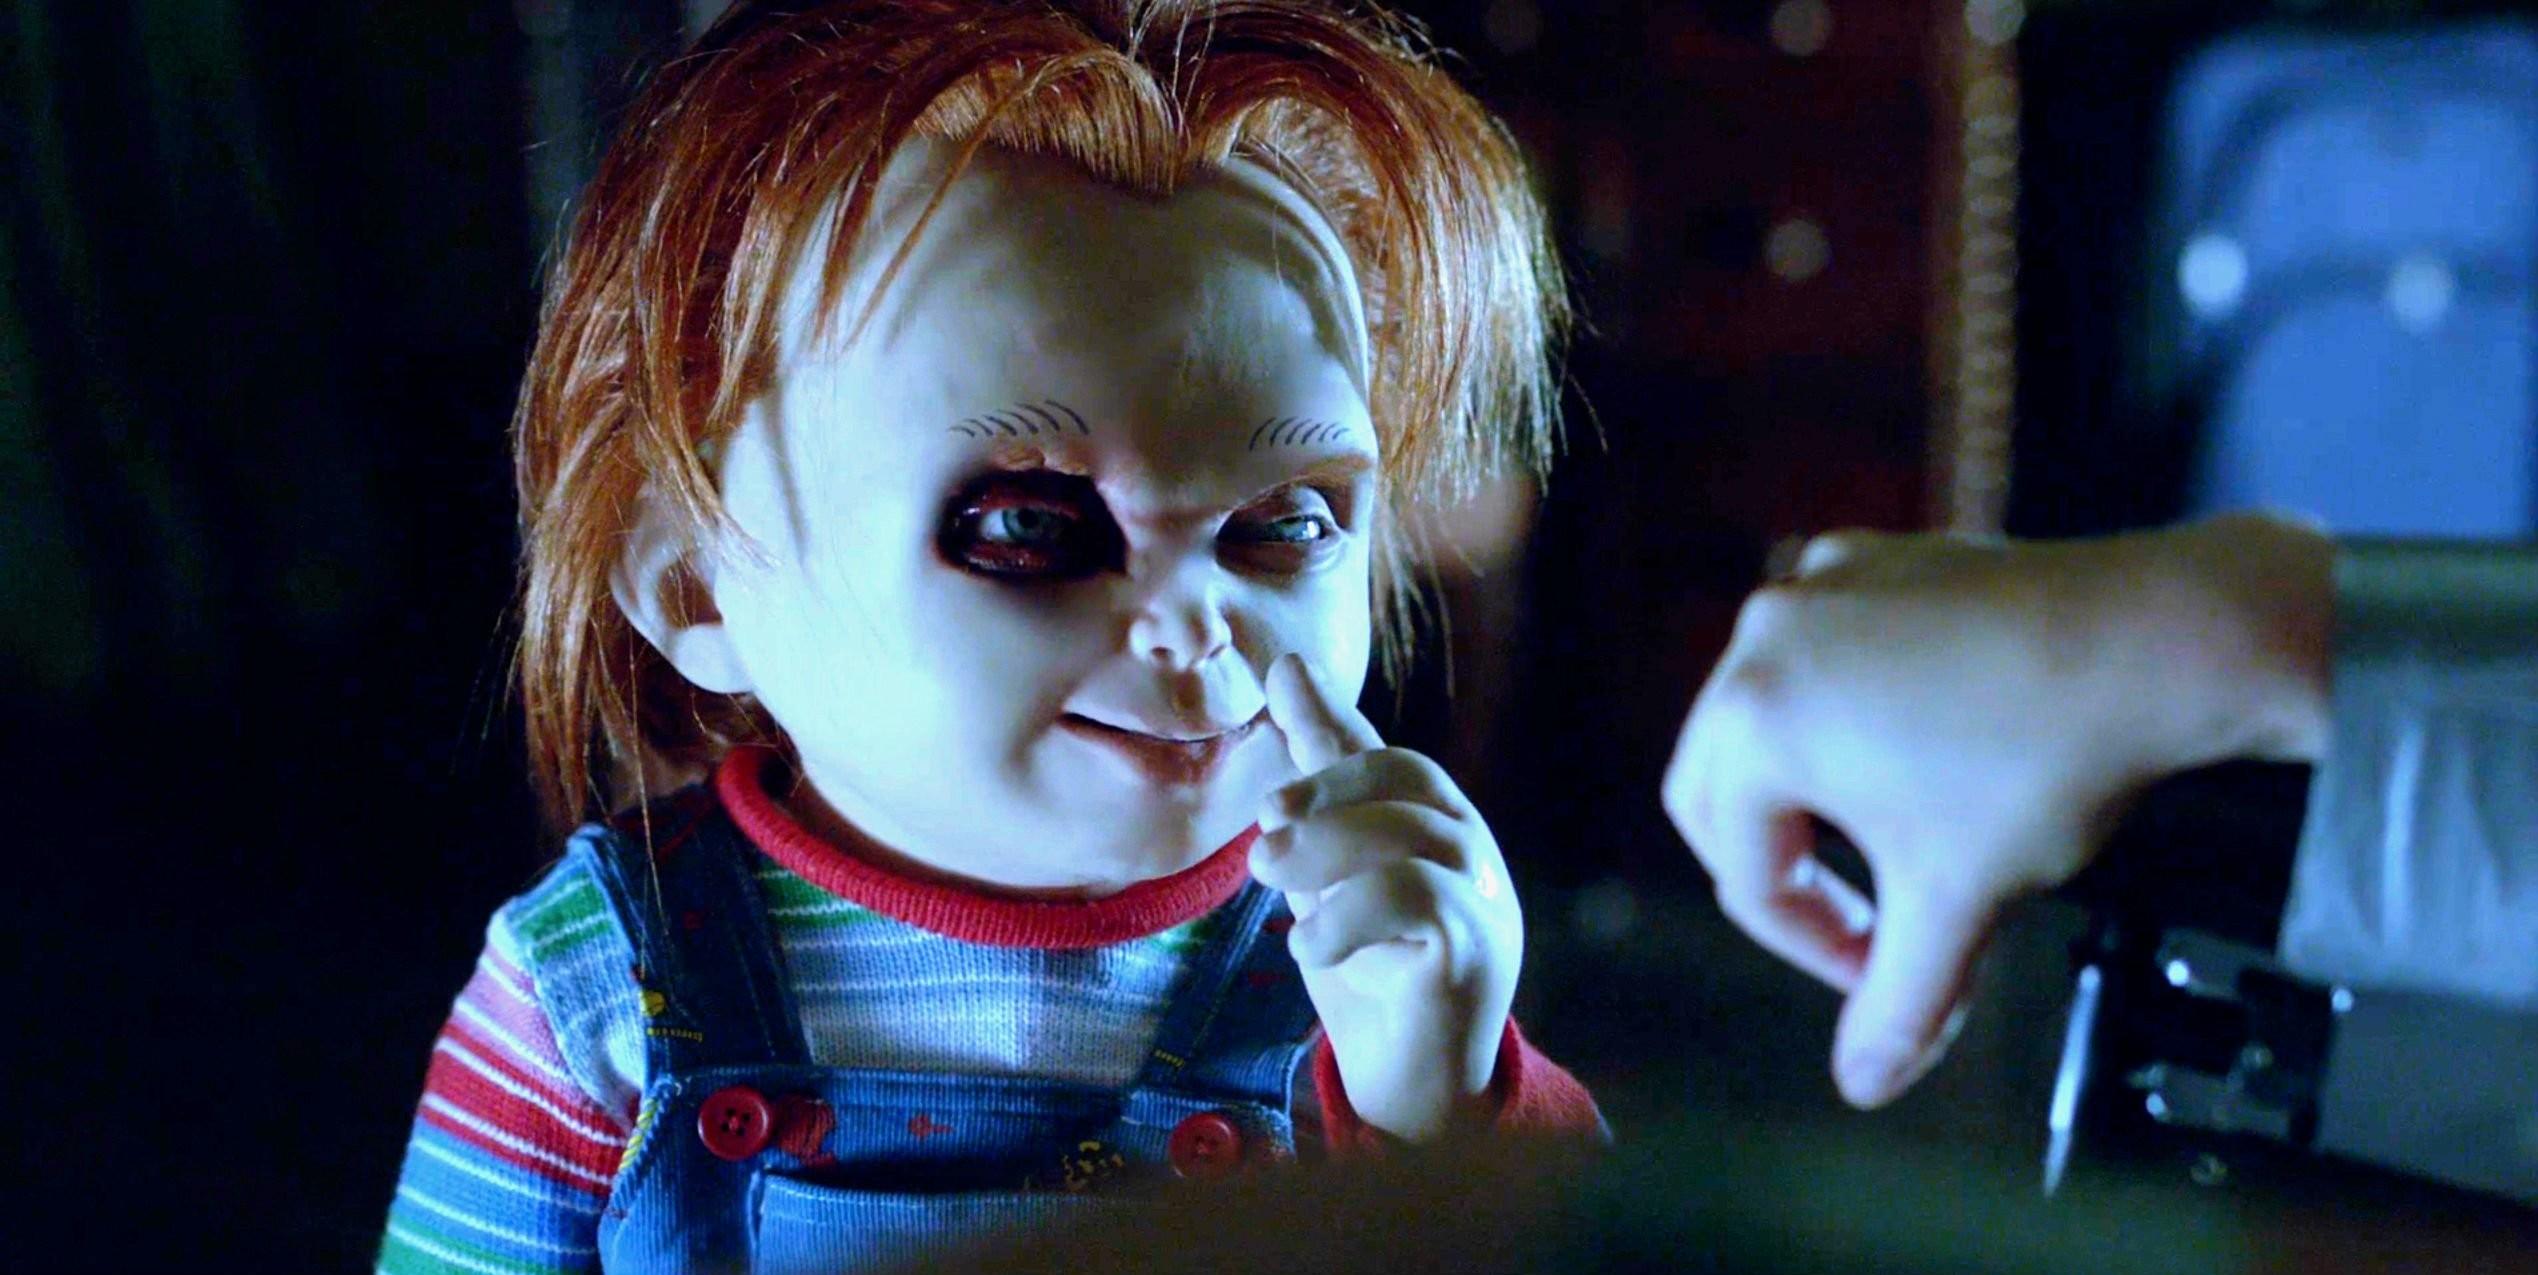 CHILDS PLAY chucky dark horror creepy scary (19) wallpaper | |  235520 | WallpaperUP